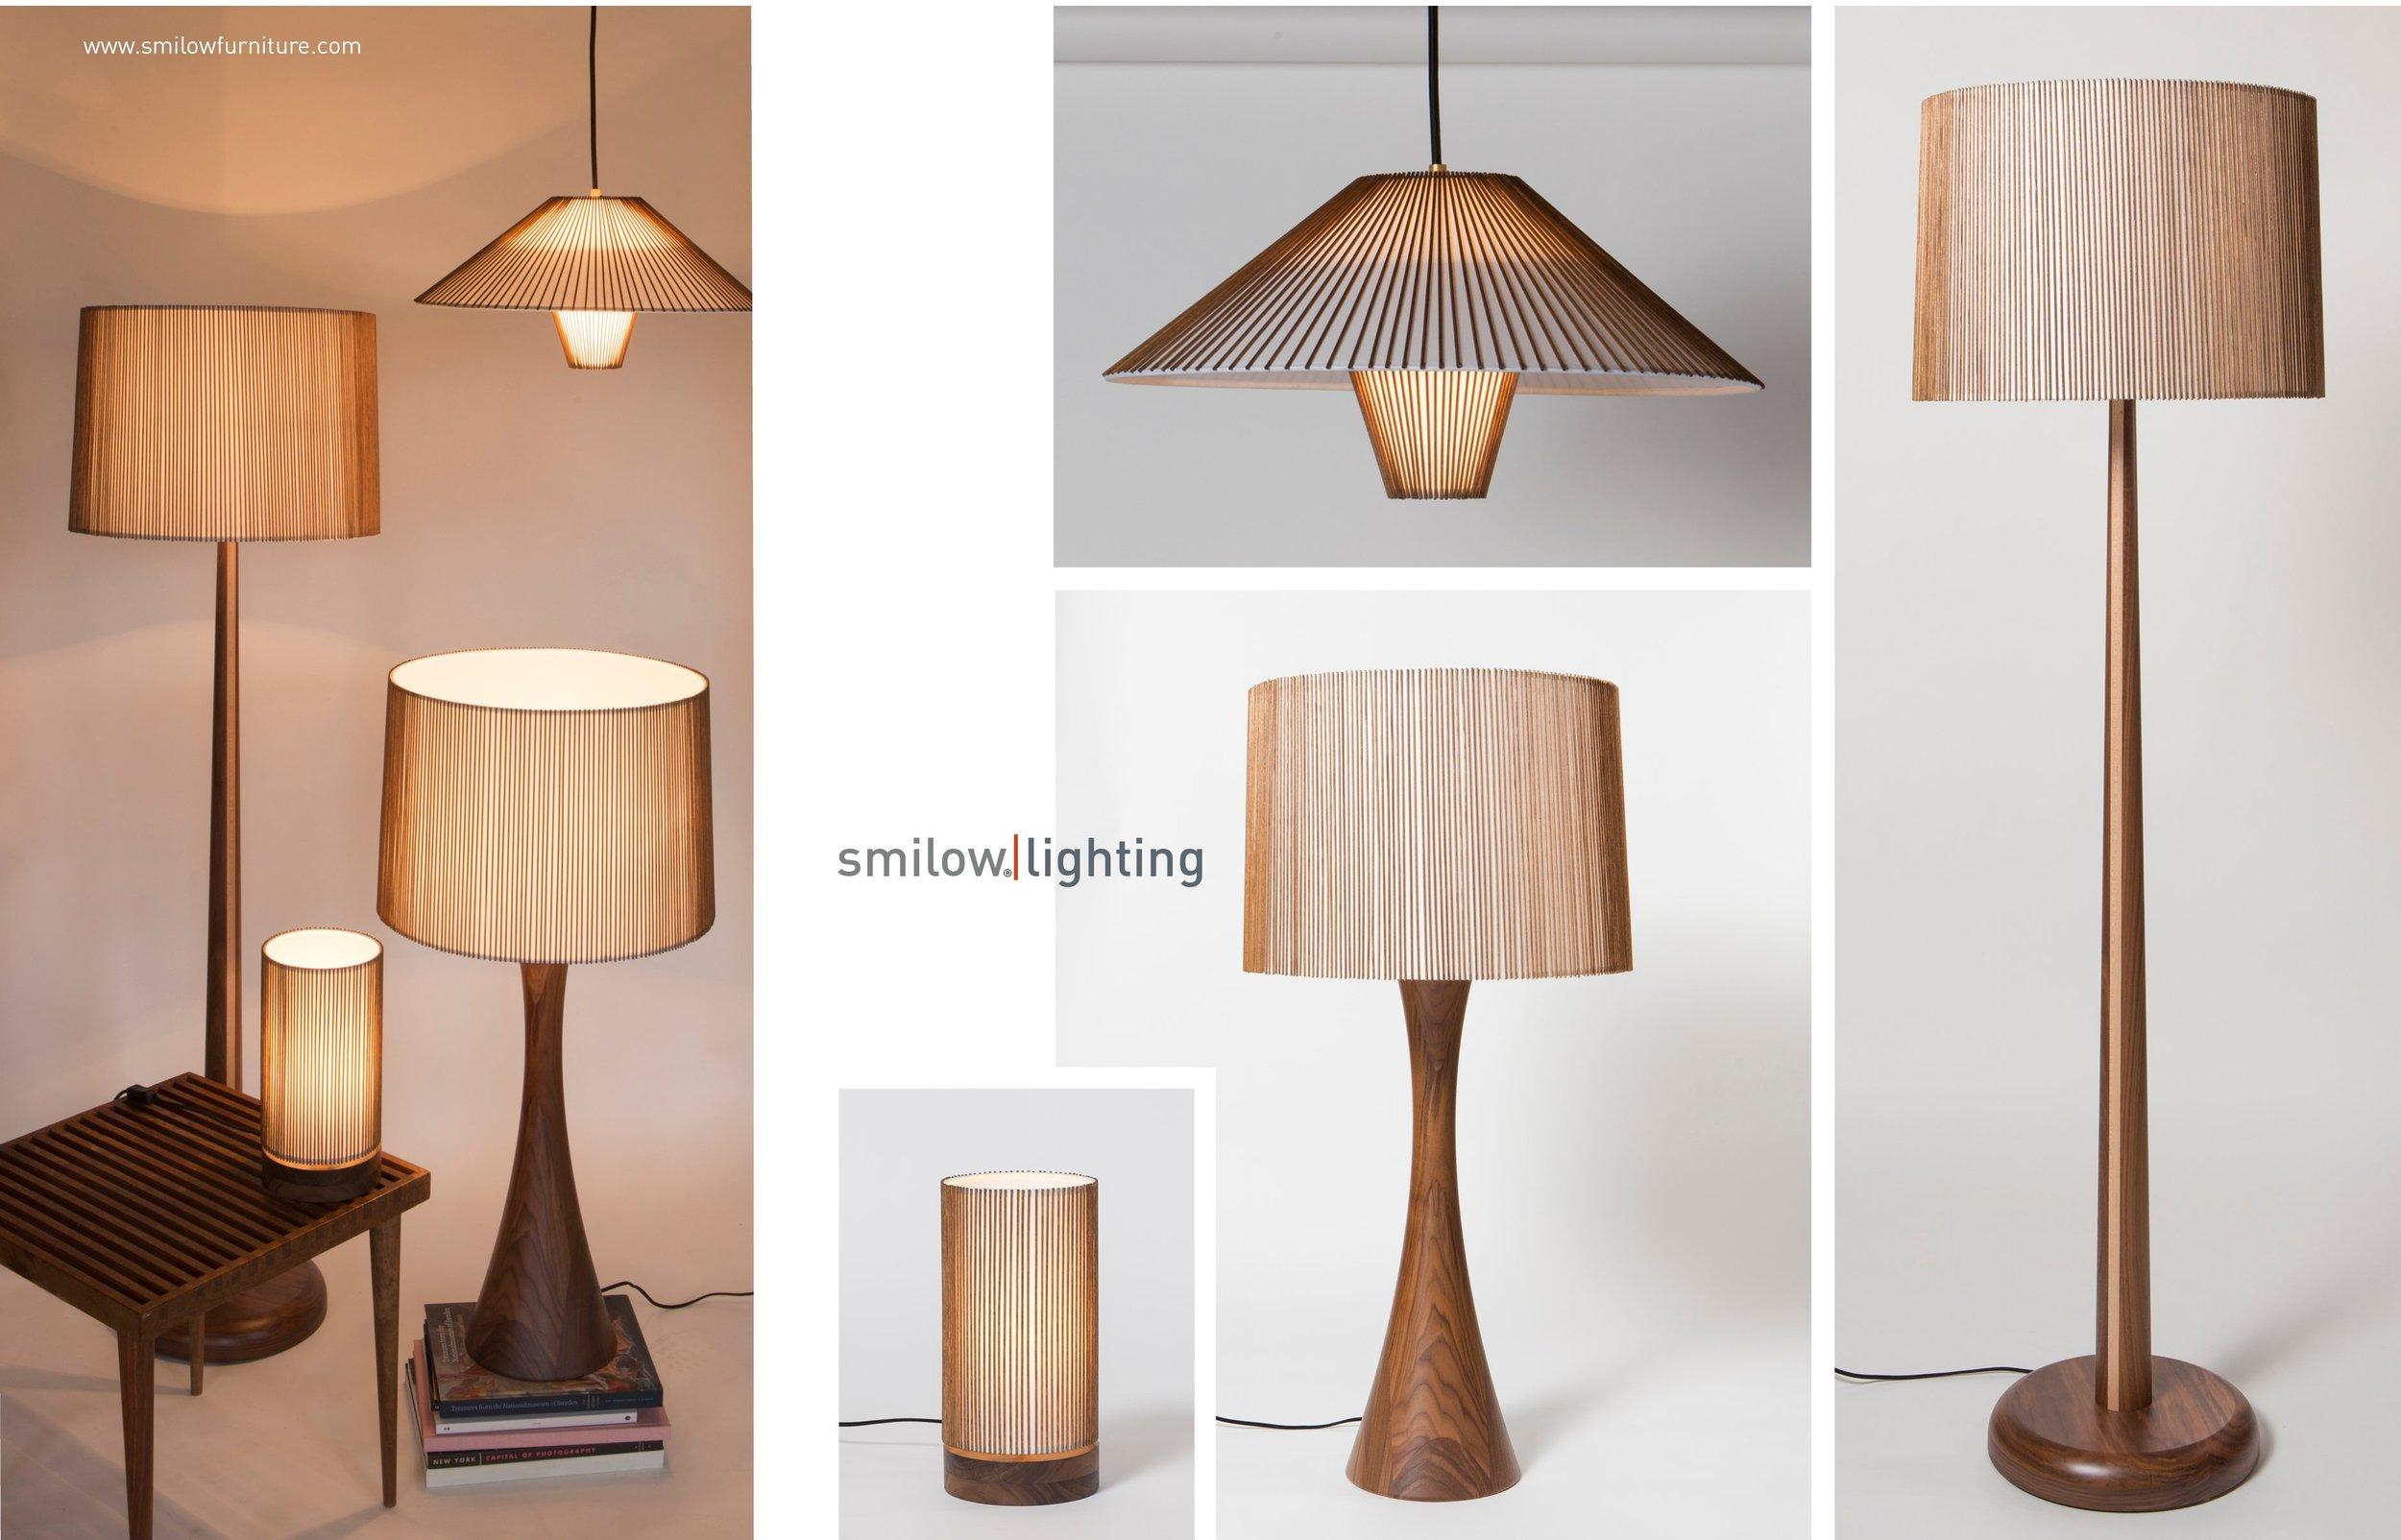 combined-lighting-photo-e1510334890461.jpg